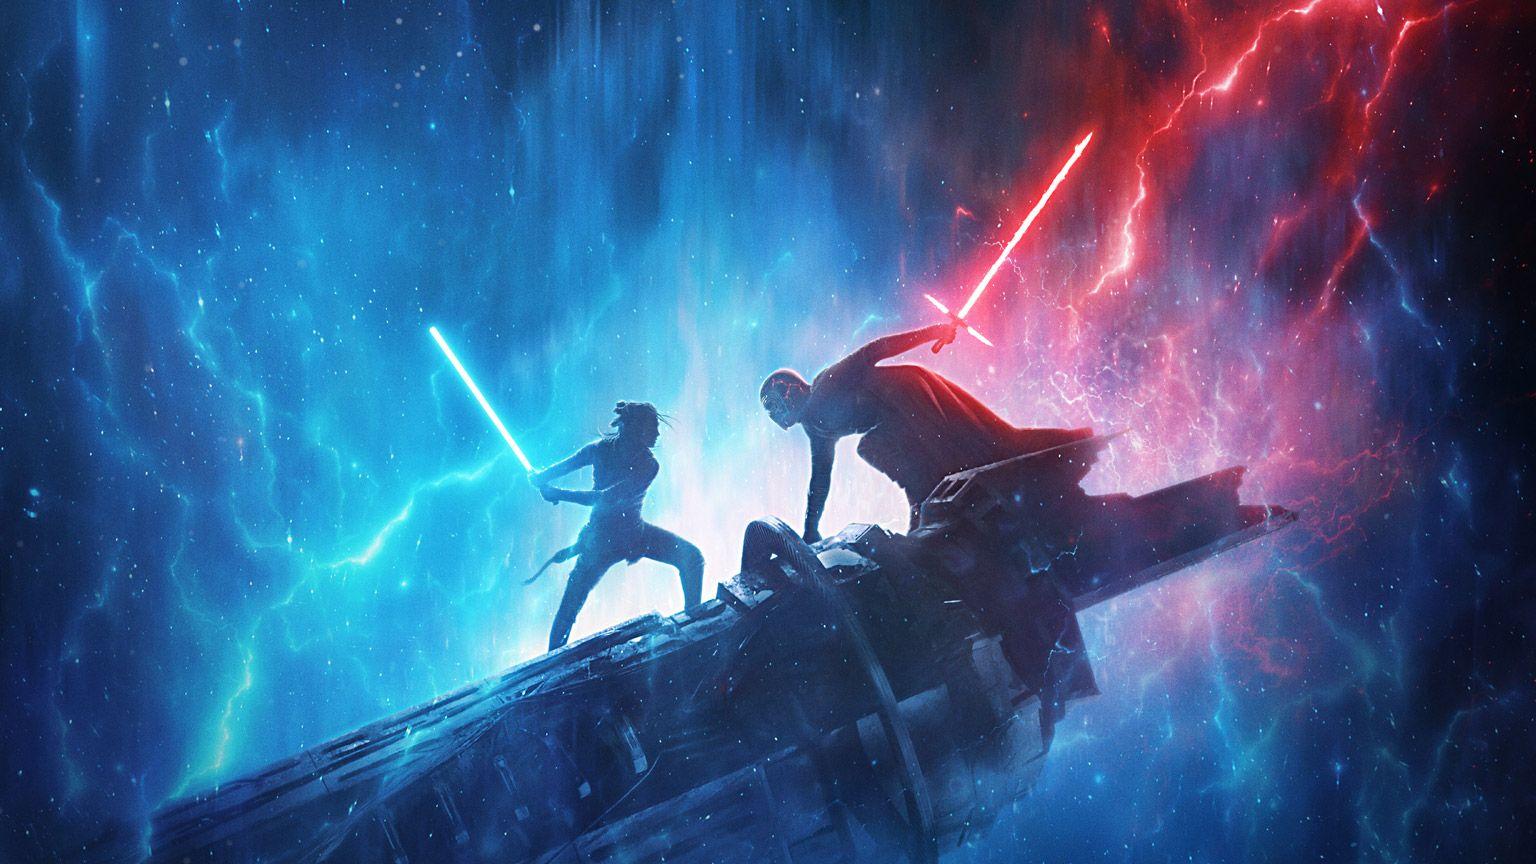 Star Wars The Rise Of Skywalker D23 Special Look Trailer Star Wars Wallpaper Star Wars Movie Star Wars Film